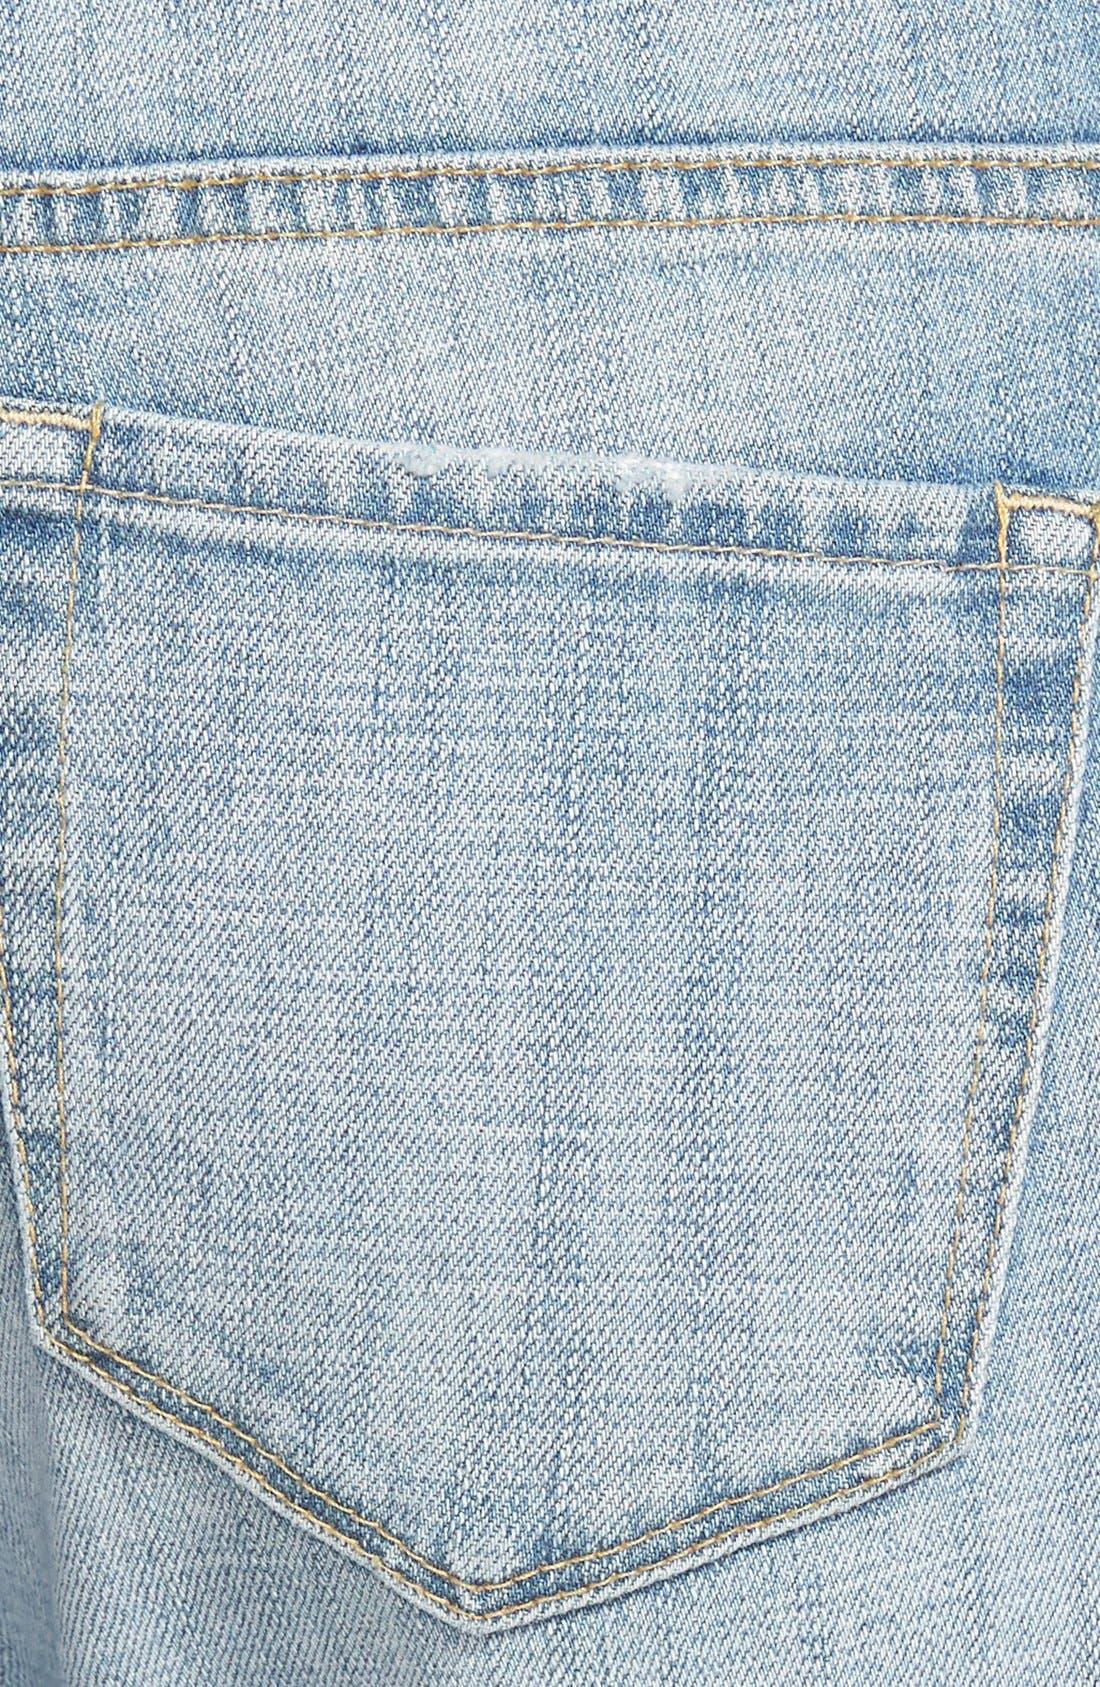 Alternate Image 4  - Treasure&Bond Boyfriend Jeans (Rustic Light Patched)